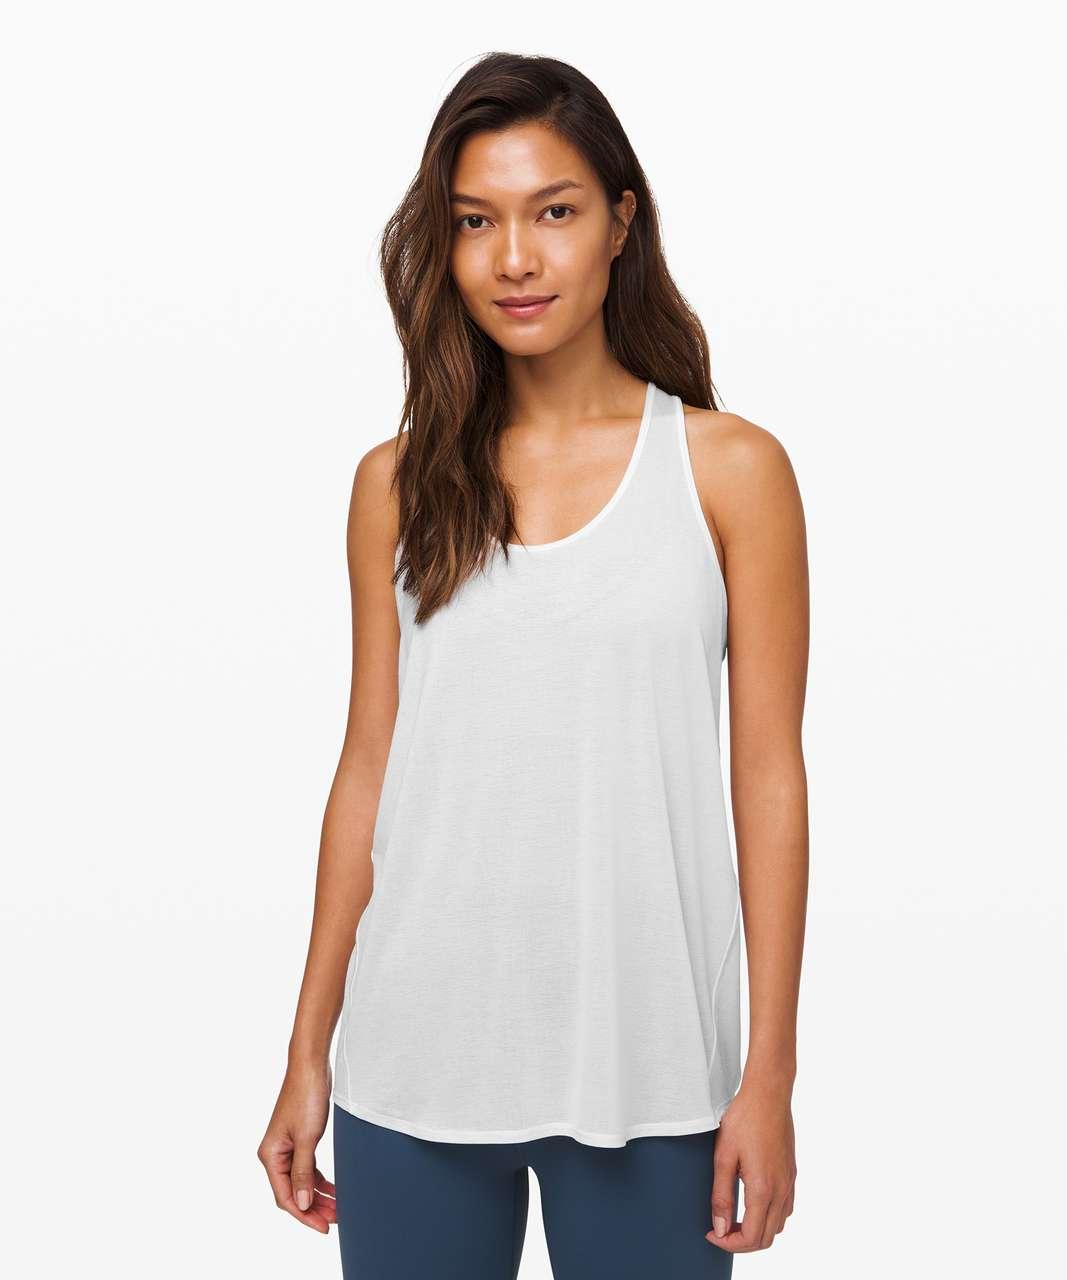 Lululemon Essential Tank Pleated *Jersey - White